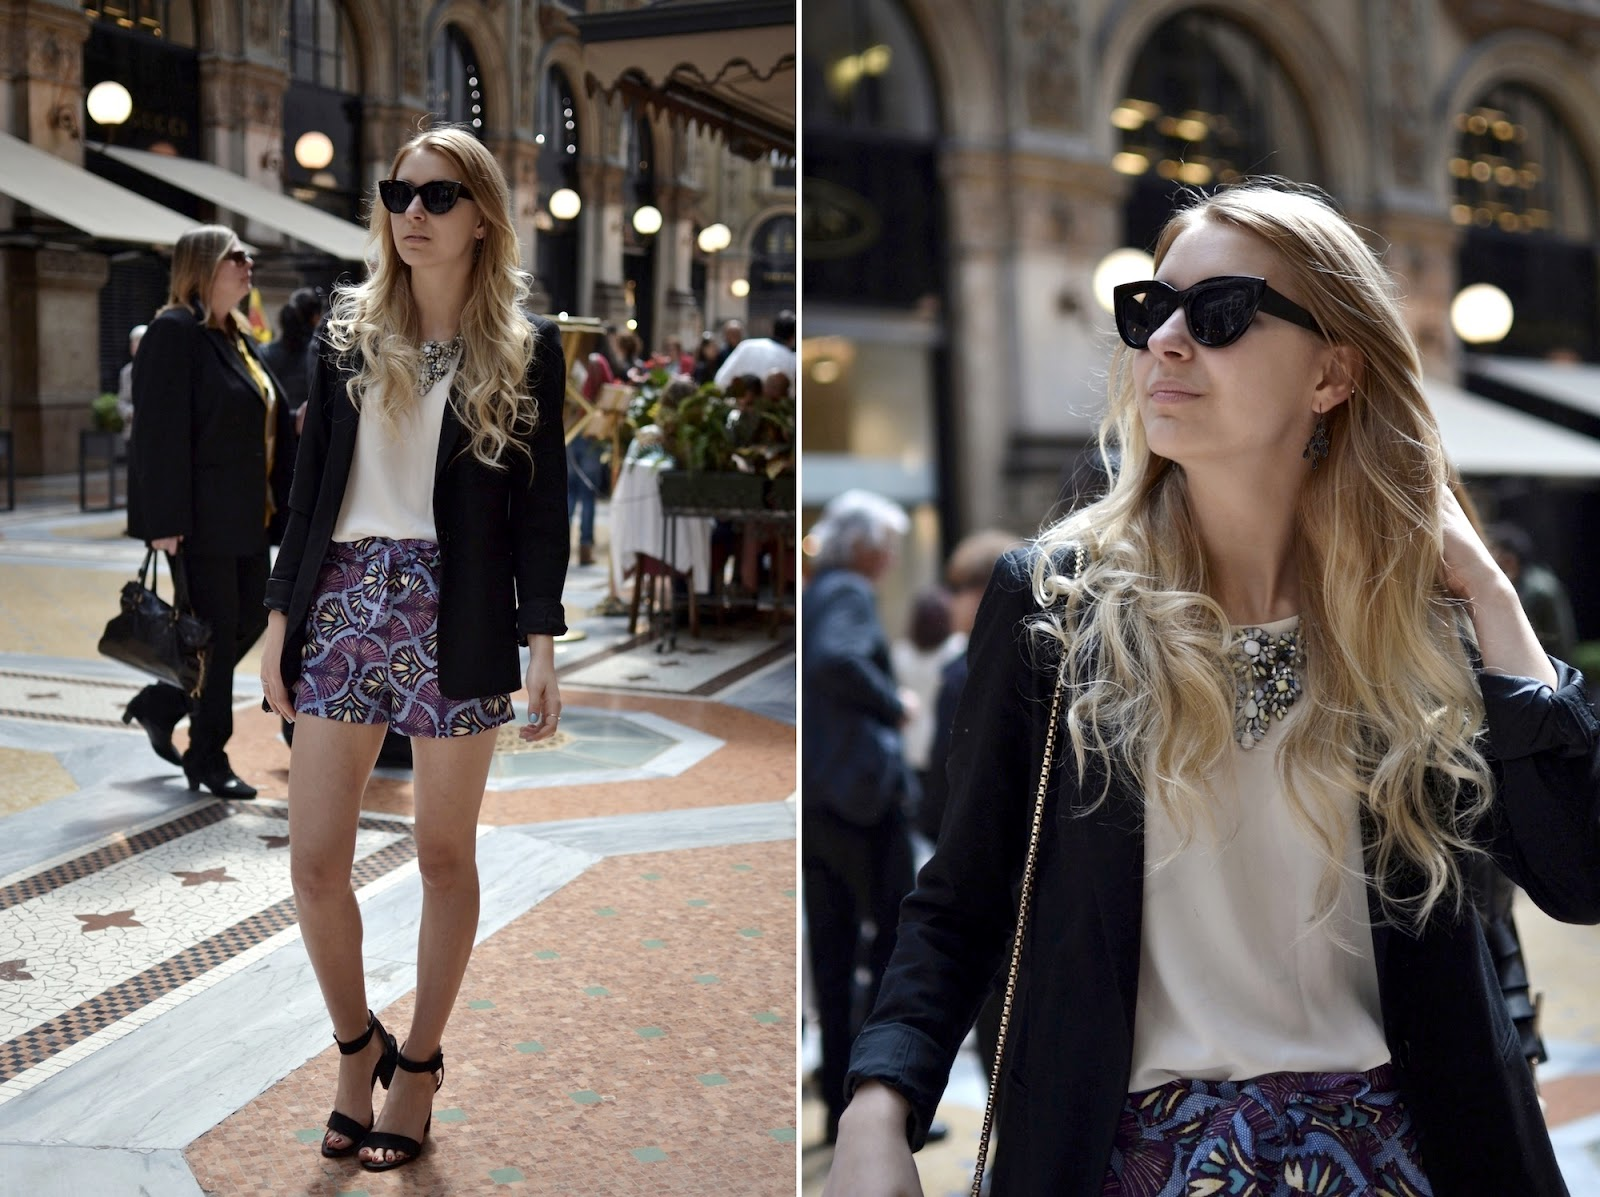 Luxembourg fashion blog